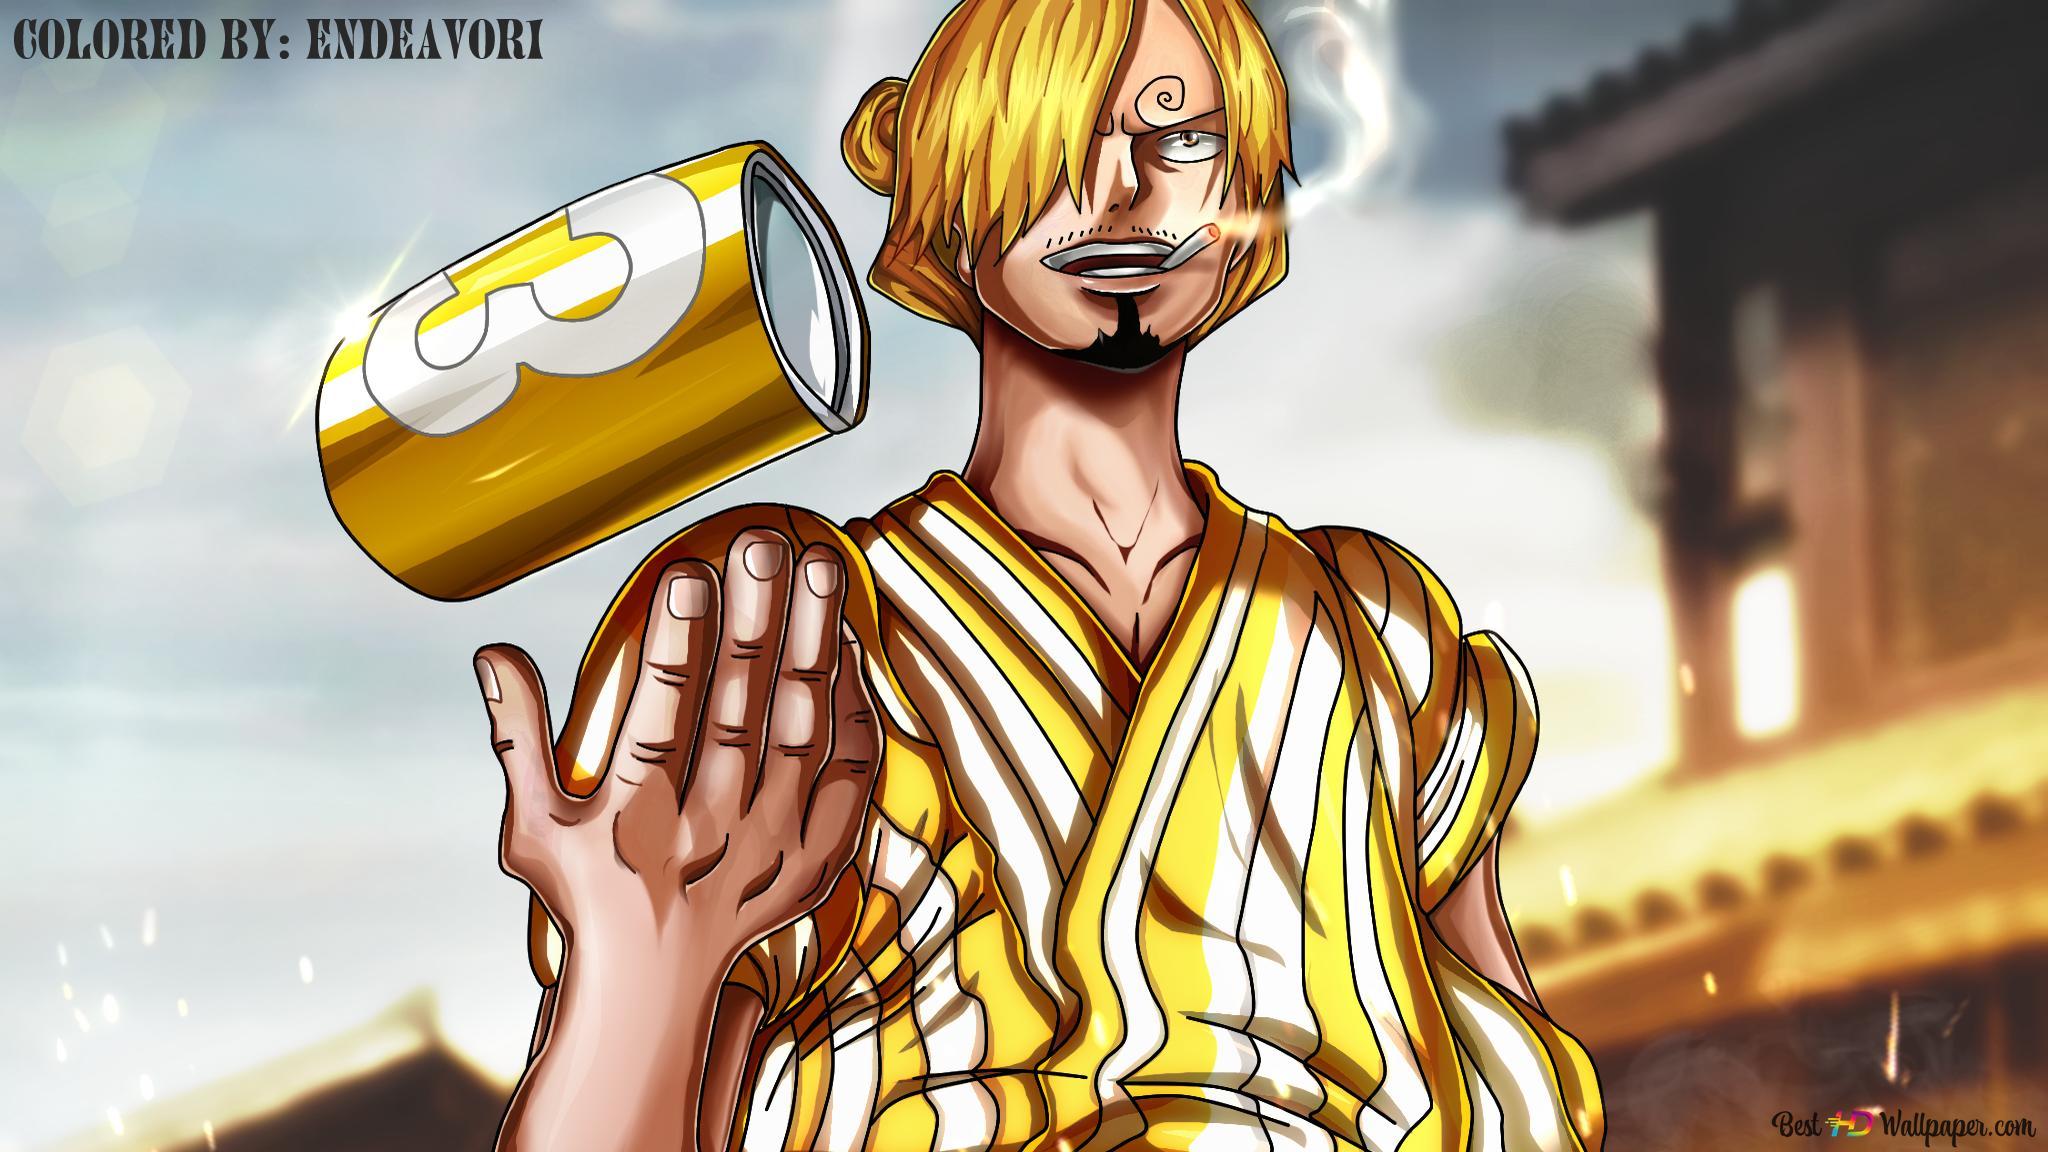 One Piece Sanji Wano Arc Kuni Hd Fond Décran Télécharger